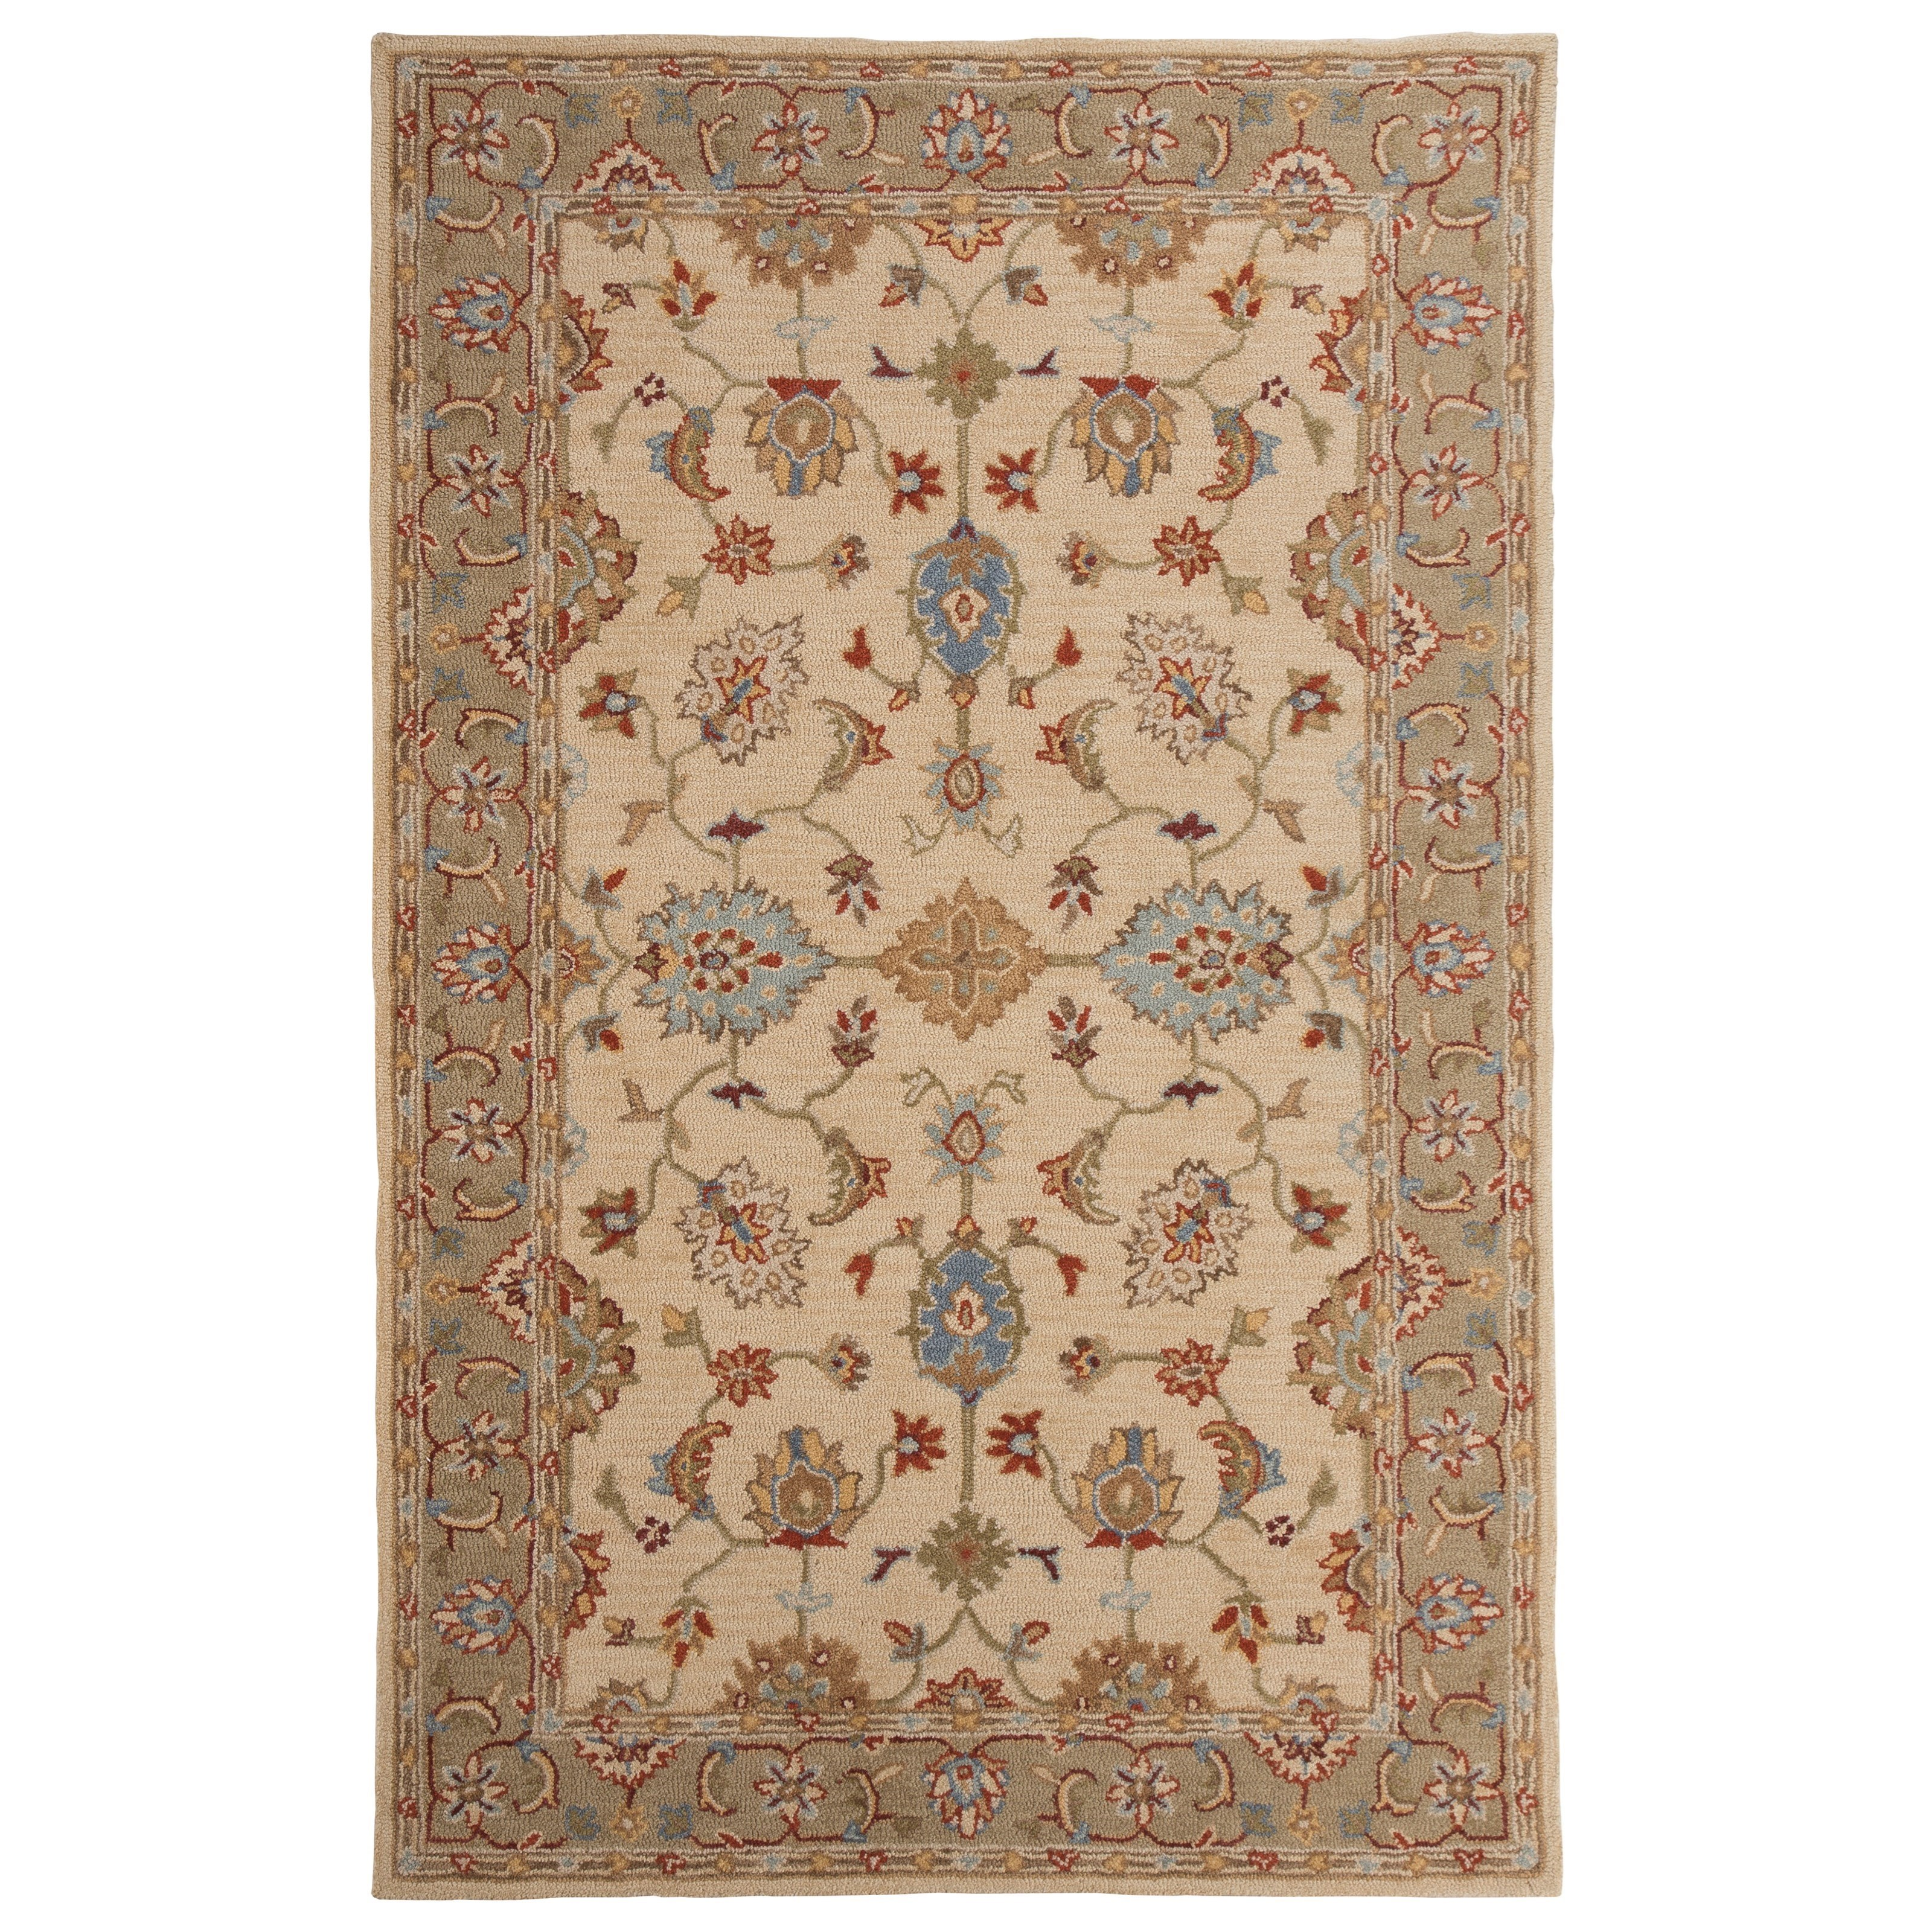 Signature Design by Ashley Traditional Classics Area Rugs Yarber Sahara Medium Rug - Item Number: R401622